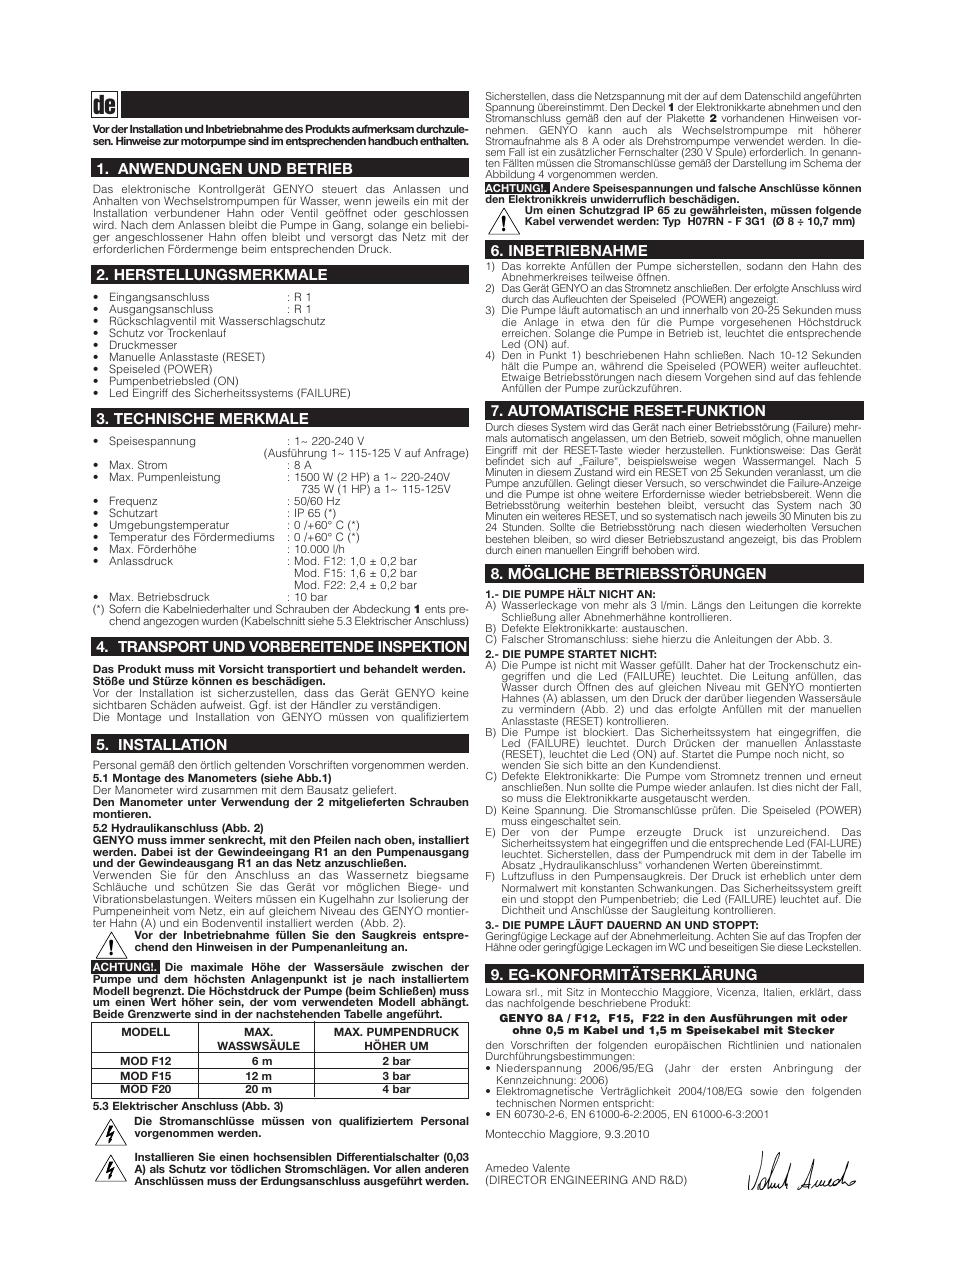 Xylem GENYO 8A / F12 F15 F22 User Manual | Page 7 / 20